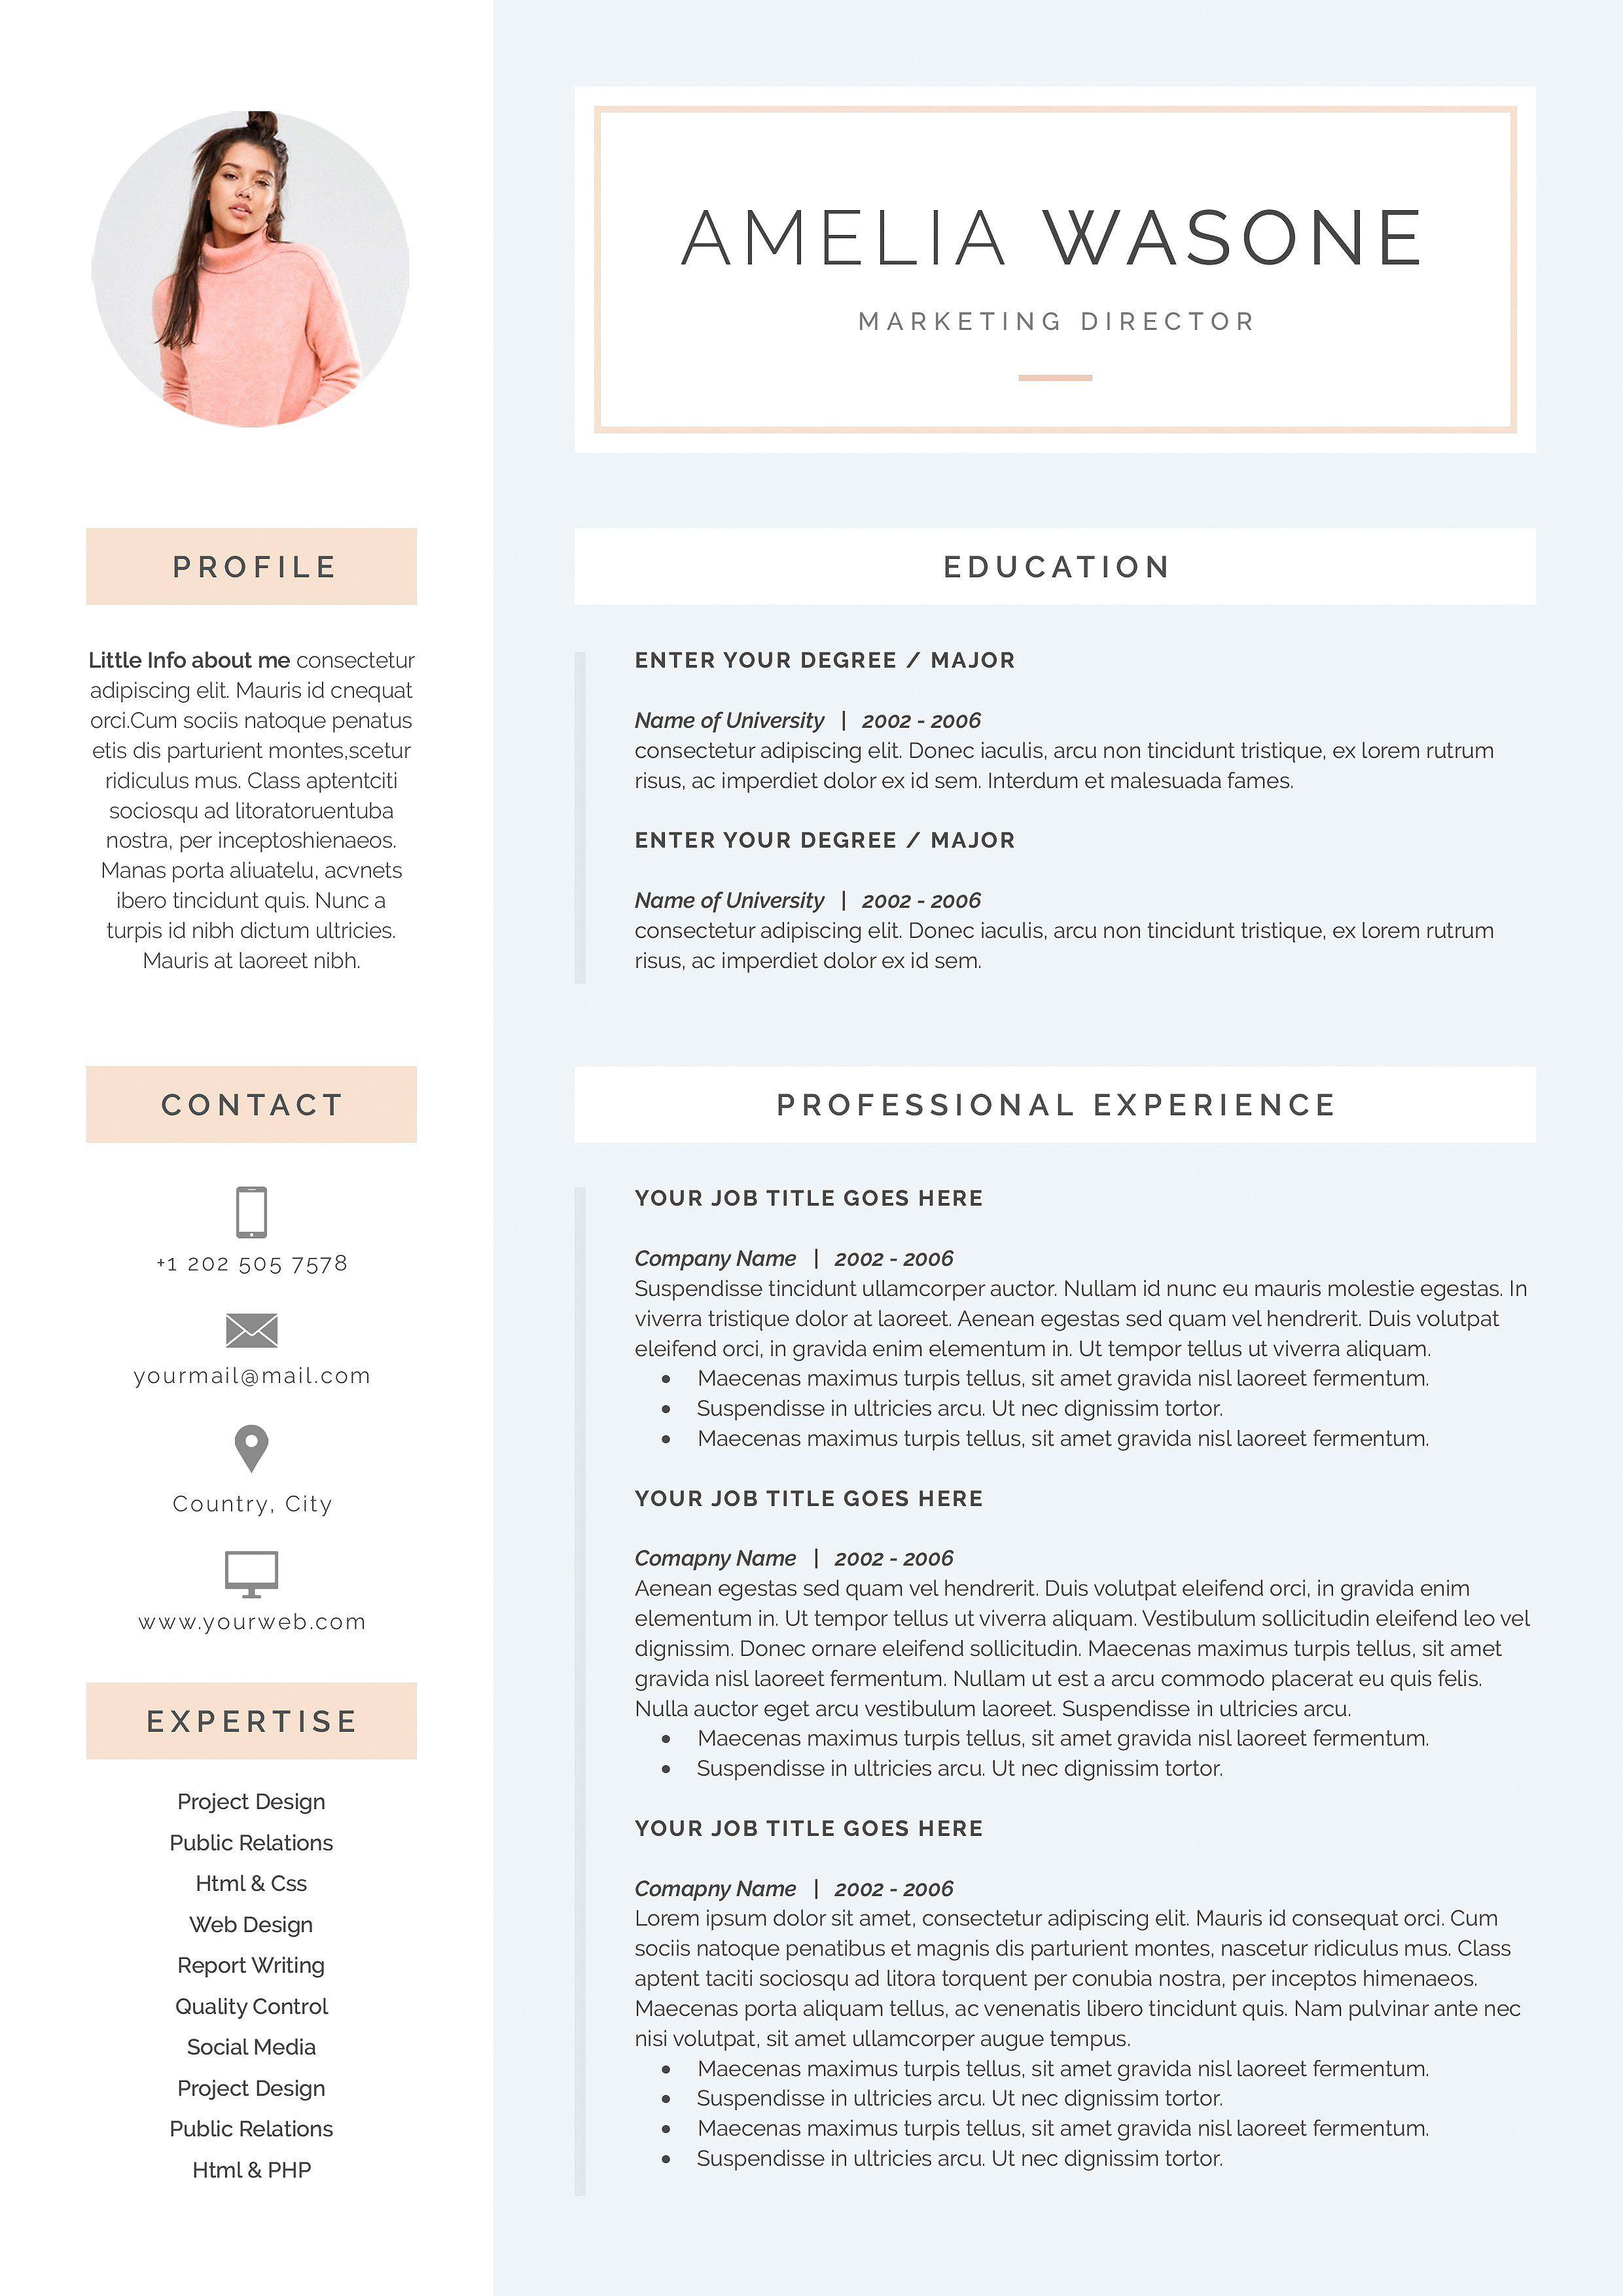 6be09b07d91753f5022494d8bebc8f29 Q Amp A Resume Format on for job experience, best college, sample fresher, templates free, cv vs, civil engineering, printable blank,